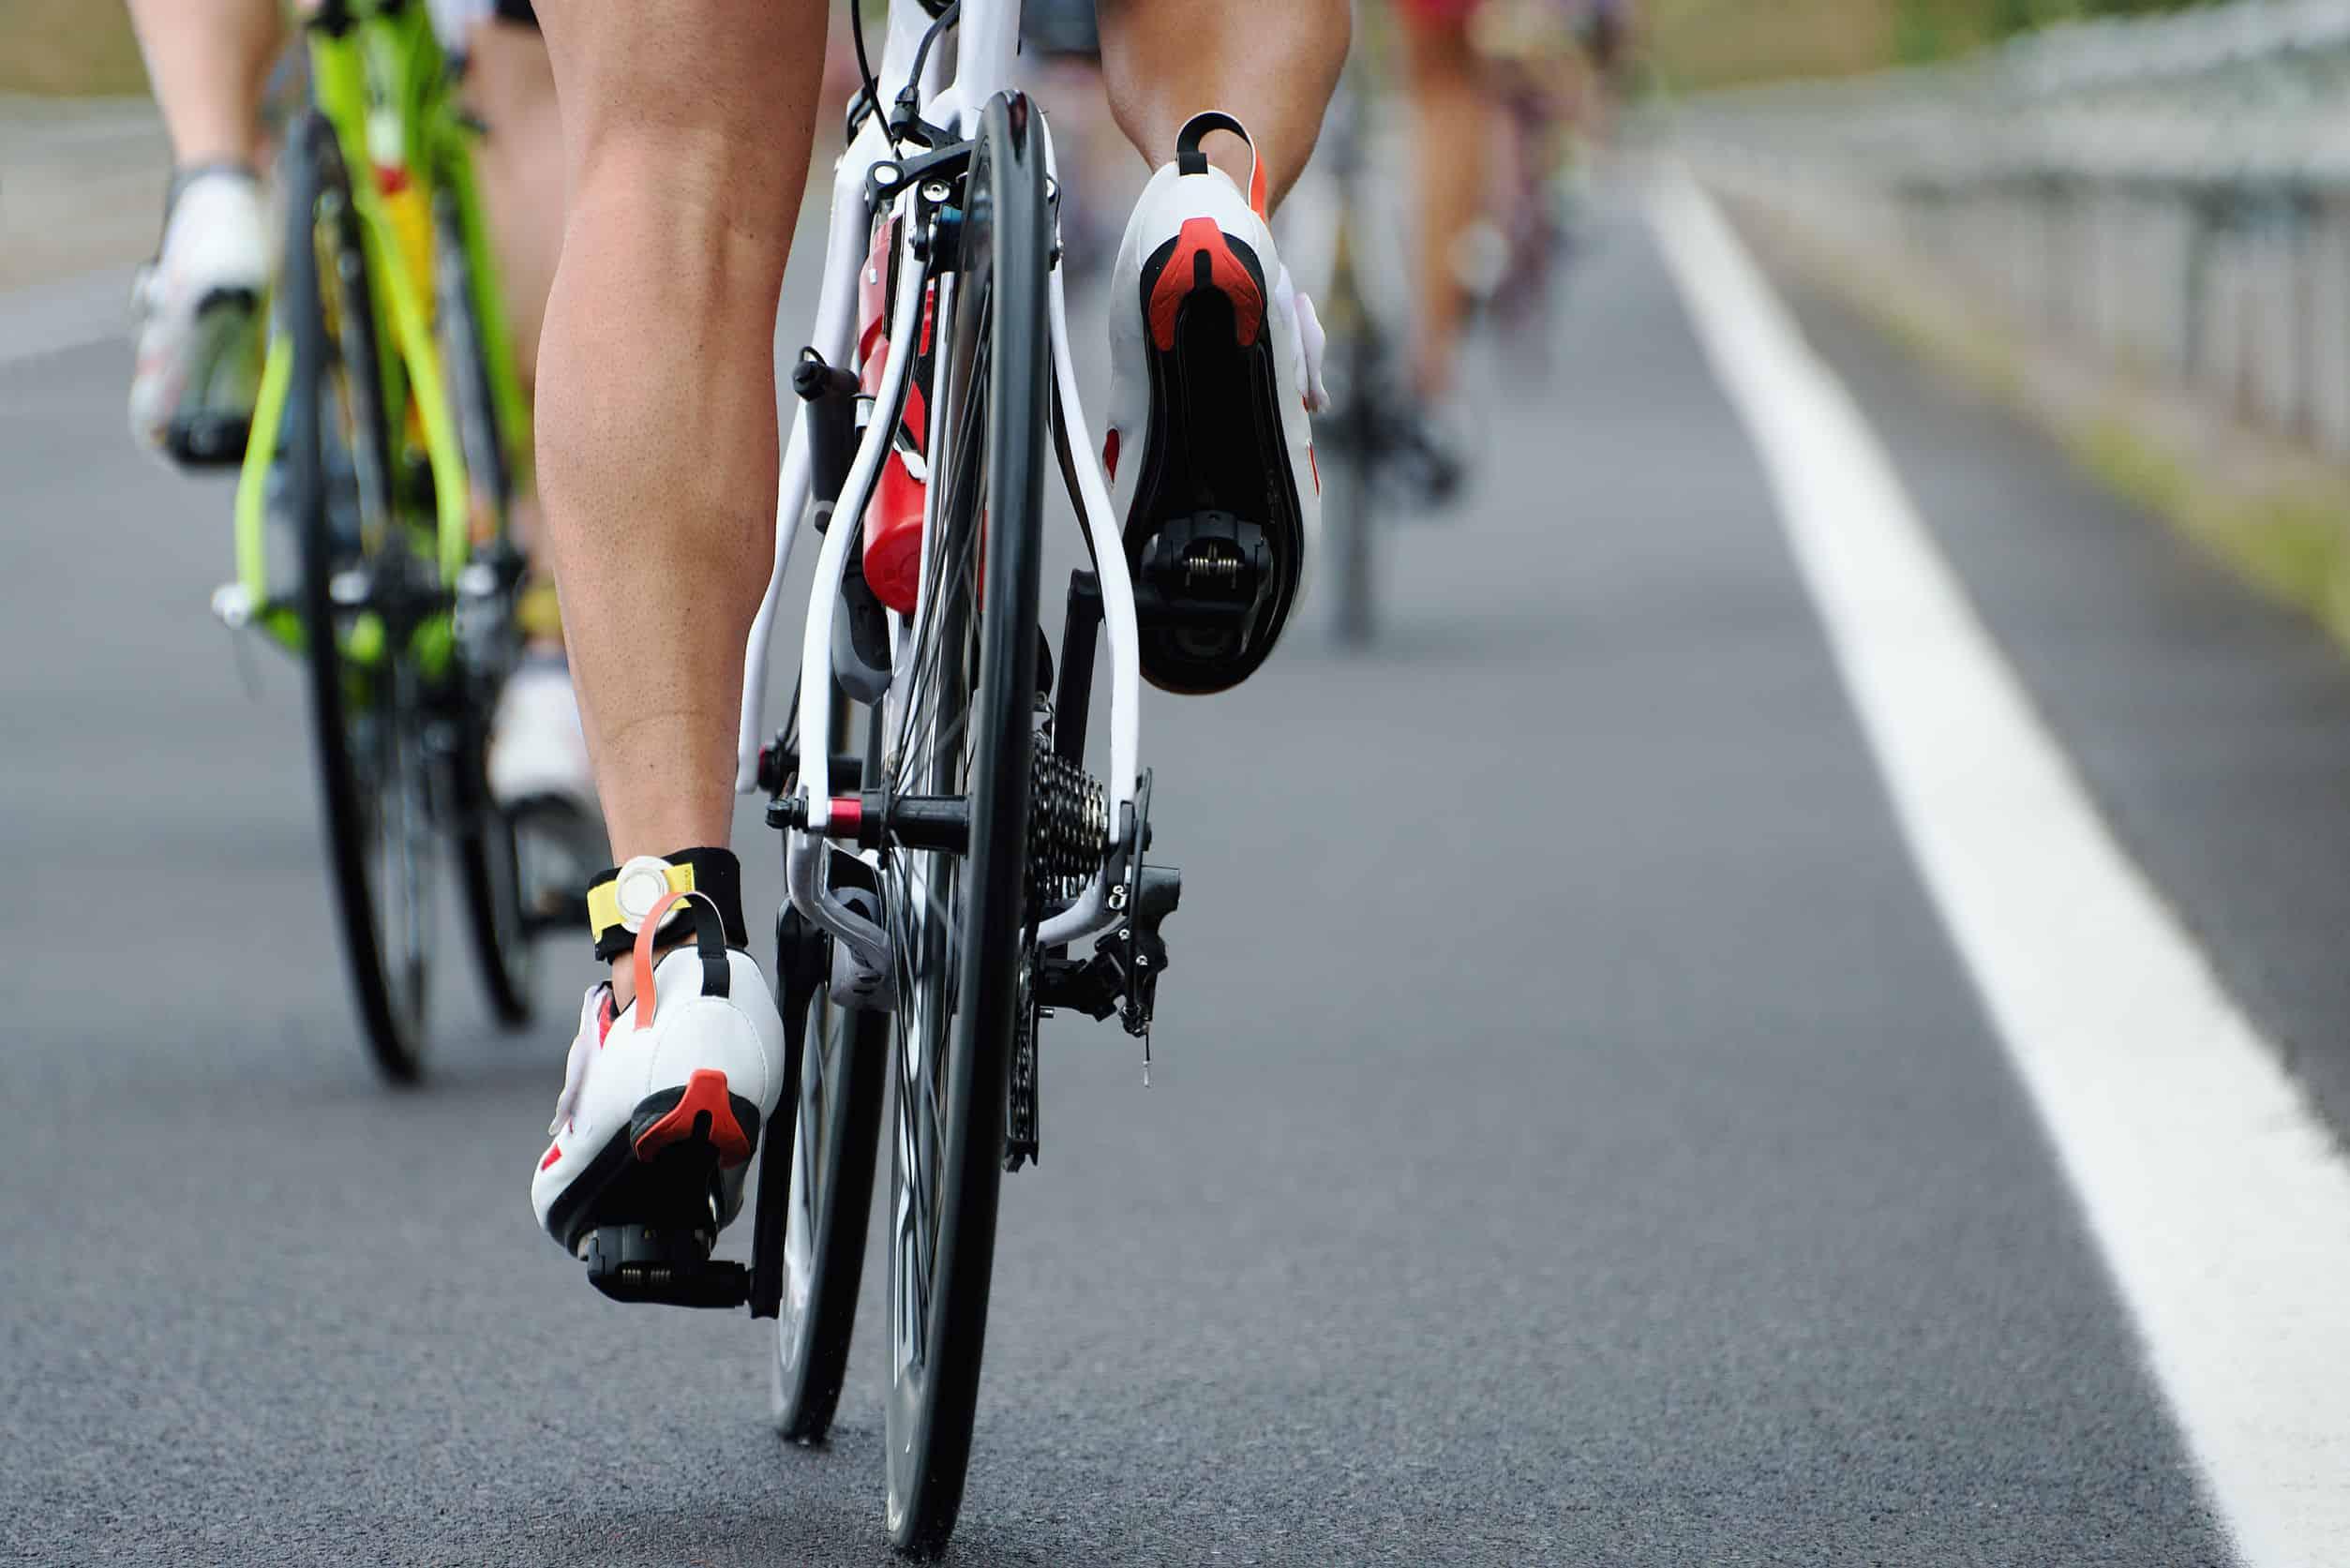 Cliploze pedalen: test & aanbevelingen (10/21)